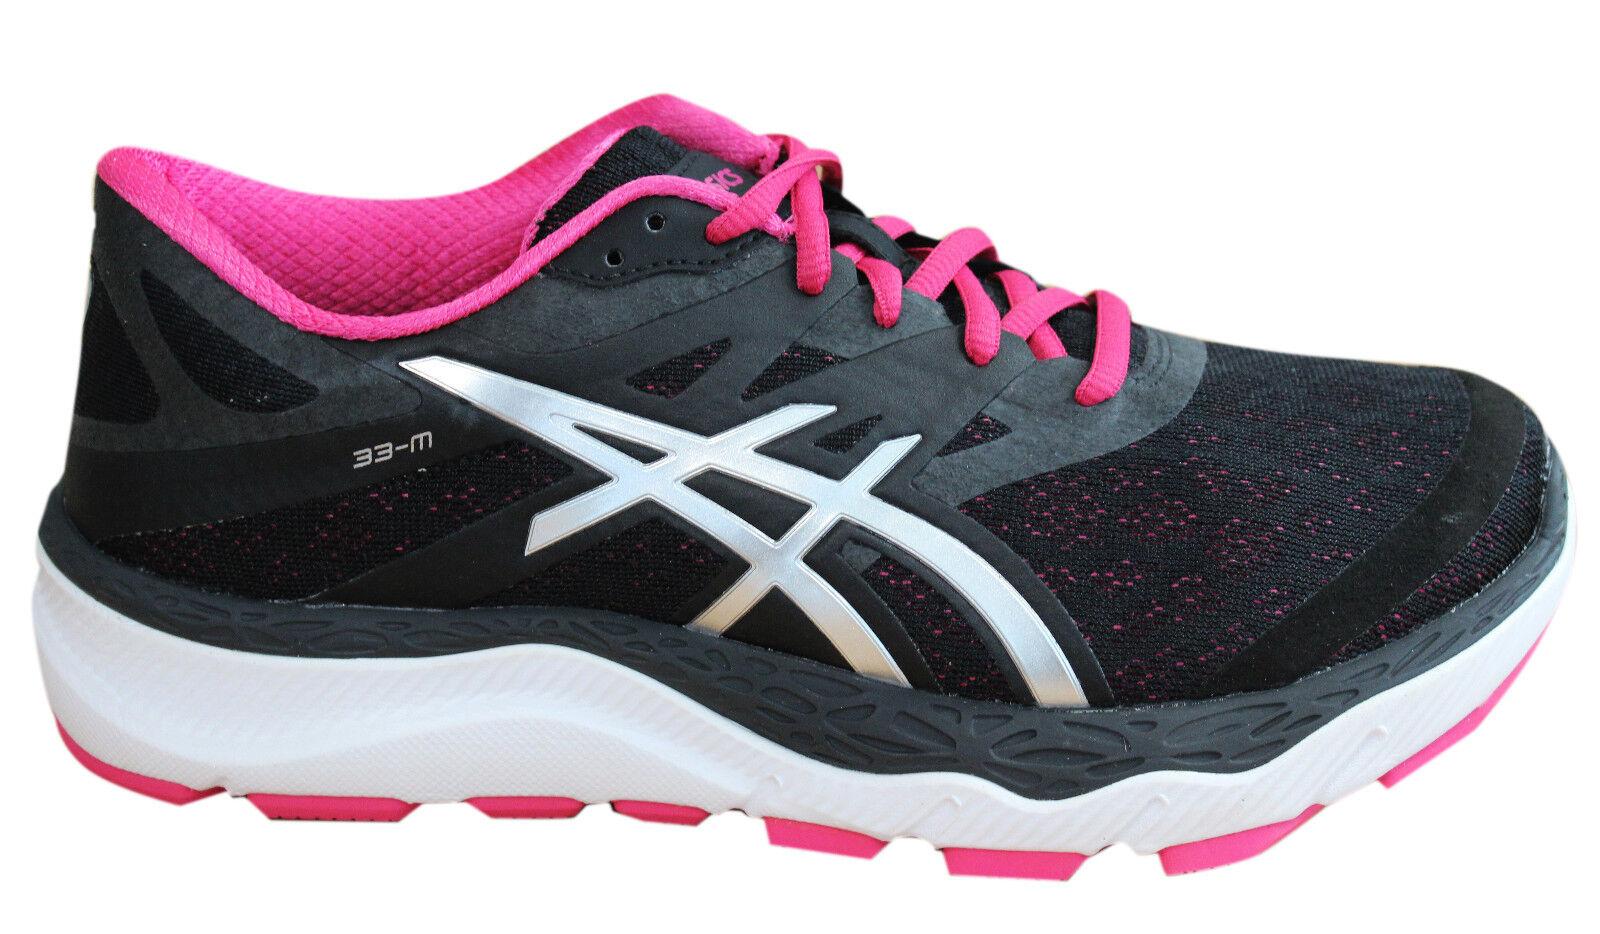 Asics 33-M Con Mujer Zapatillas Zapatos Con 33-M Cordones De Plata rosado Textil T588N 9993 D136 679d5e